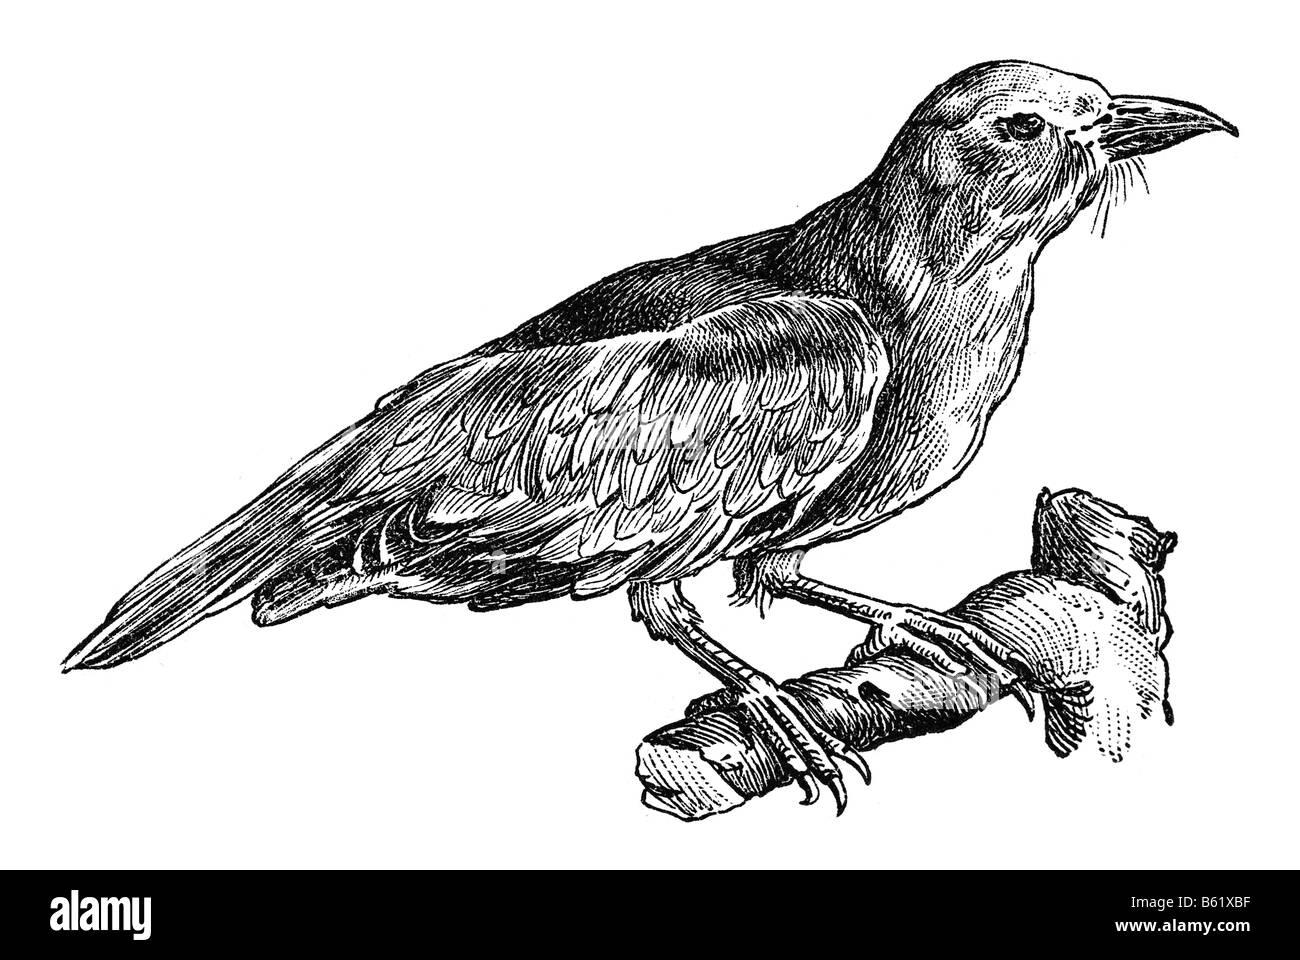 European Roller (Coracias garrulus) - Stock Image